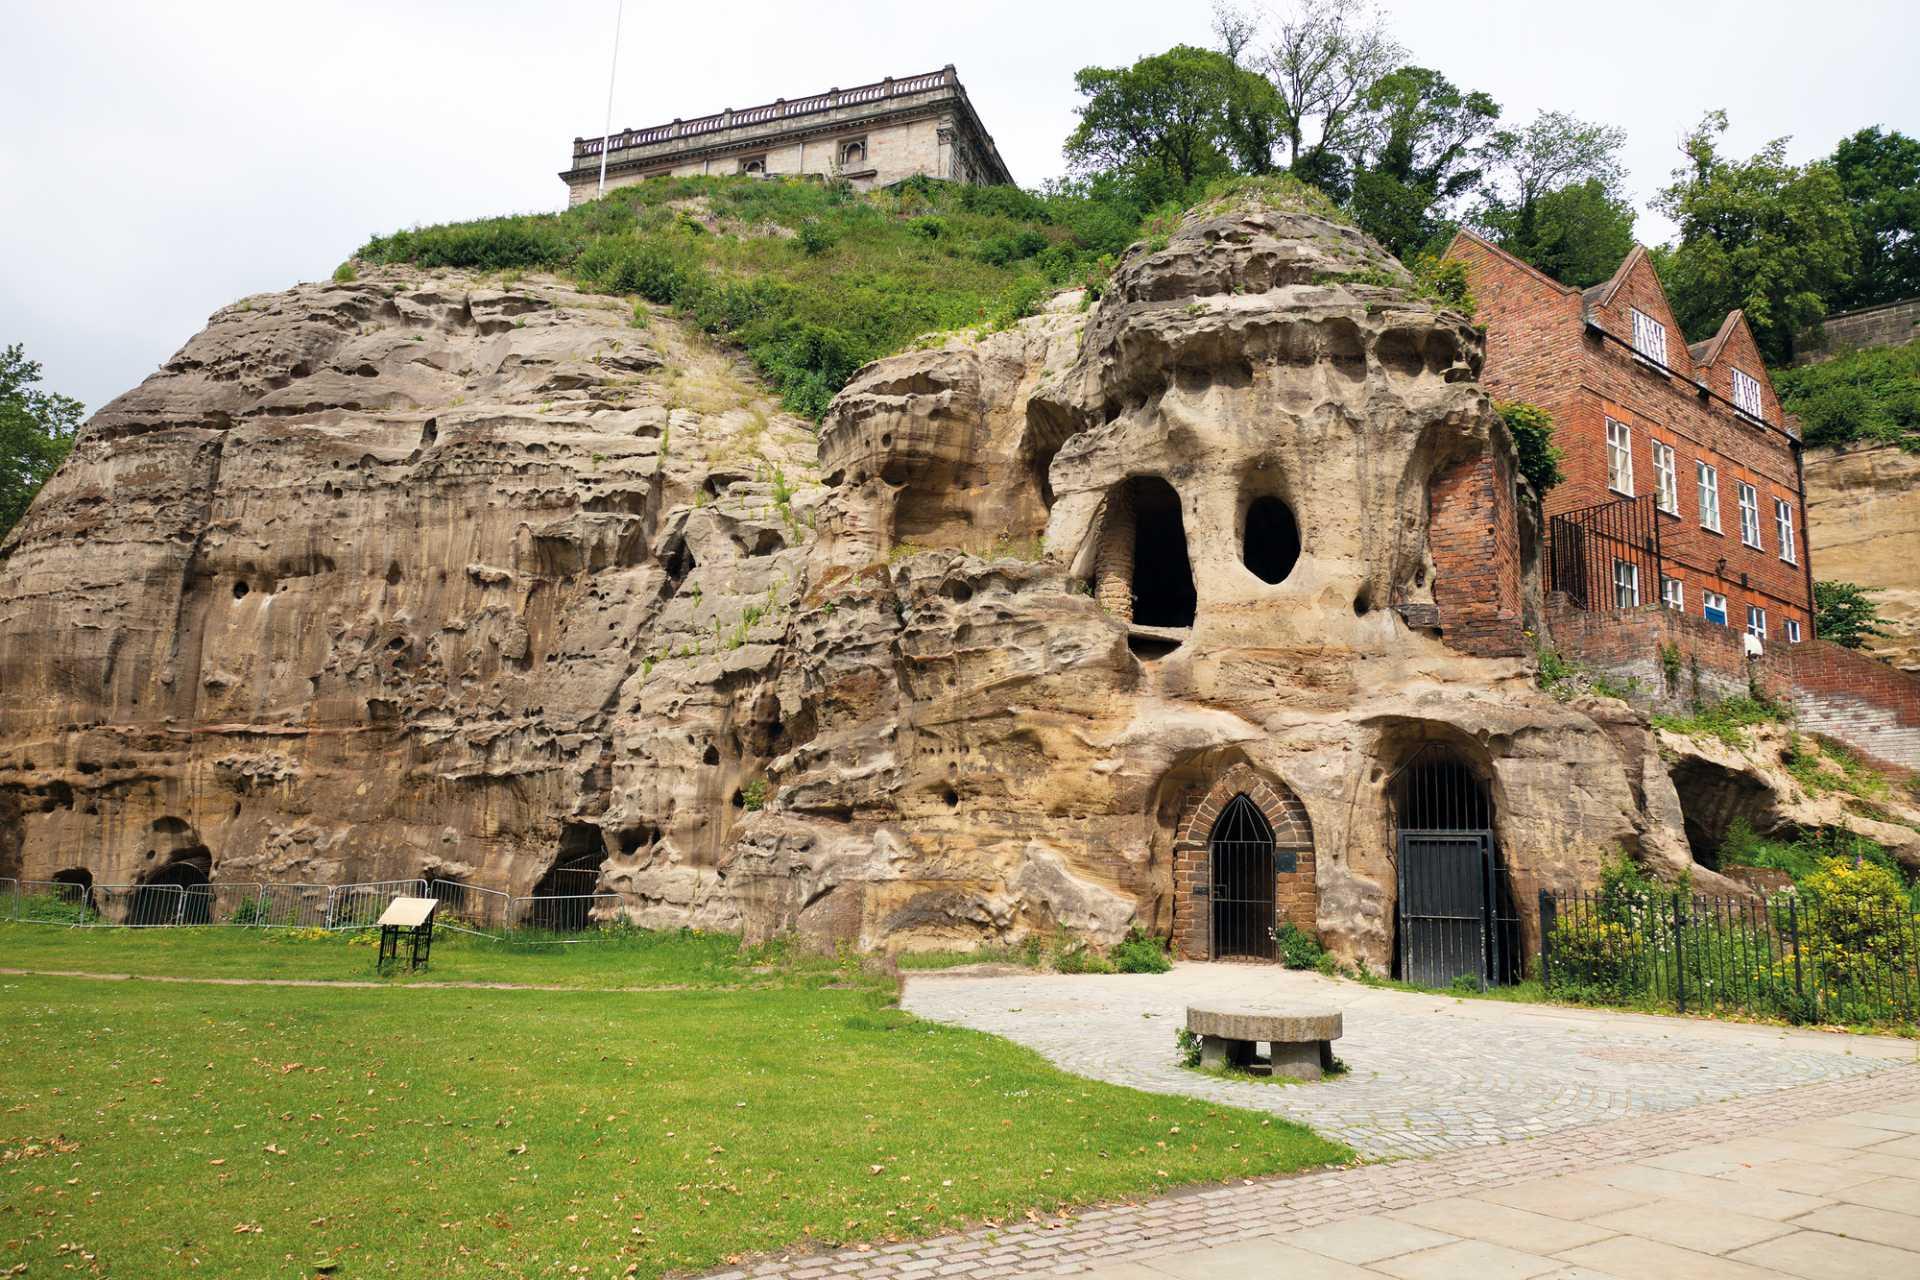 caves-inside-hillside-city-of-caves-indoor-activities-nottingham